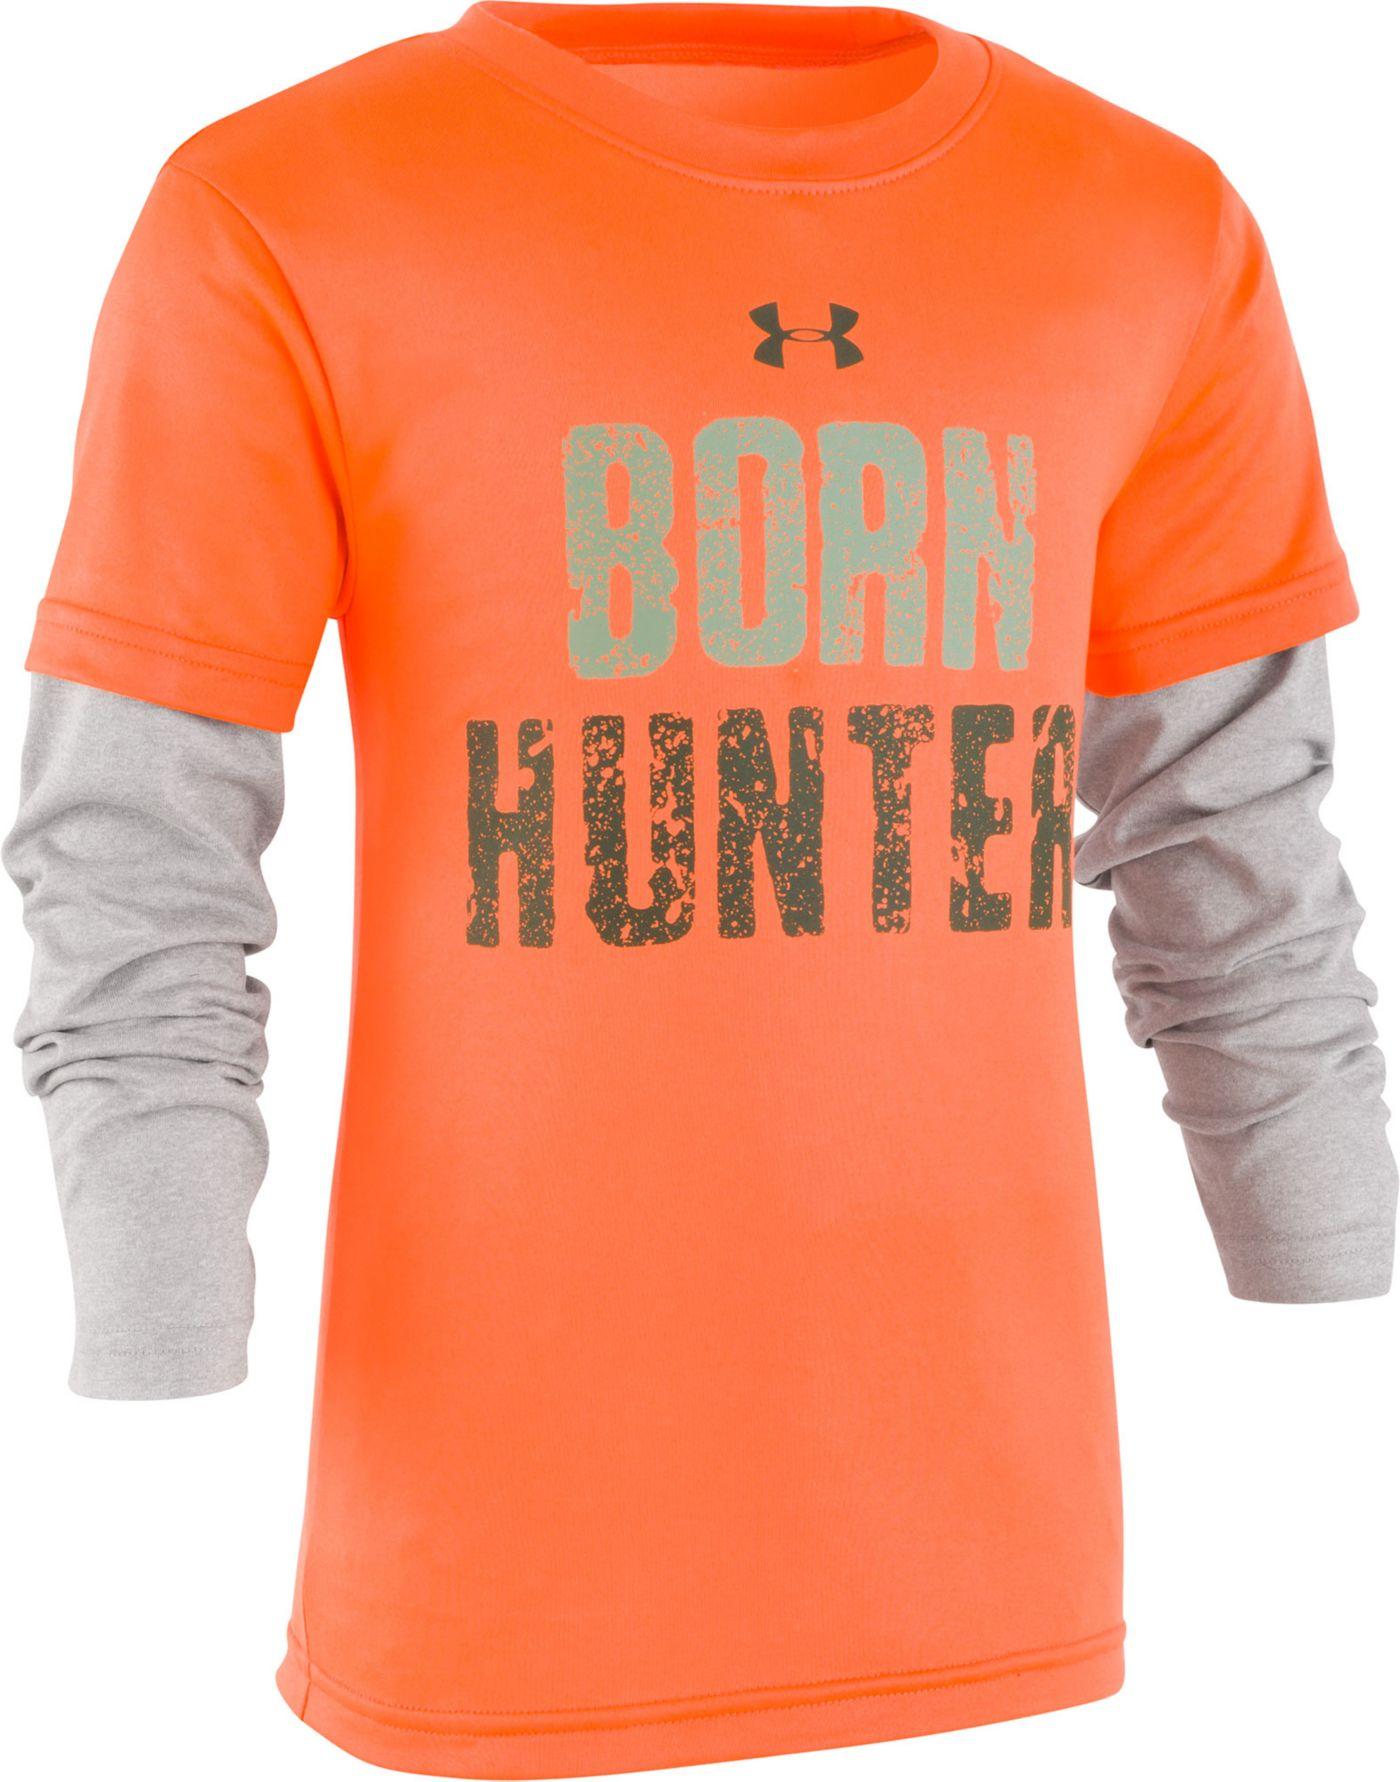 Under Armour Toddler Boys' Born to Hunt Slider Long Sleeve Shirt